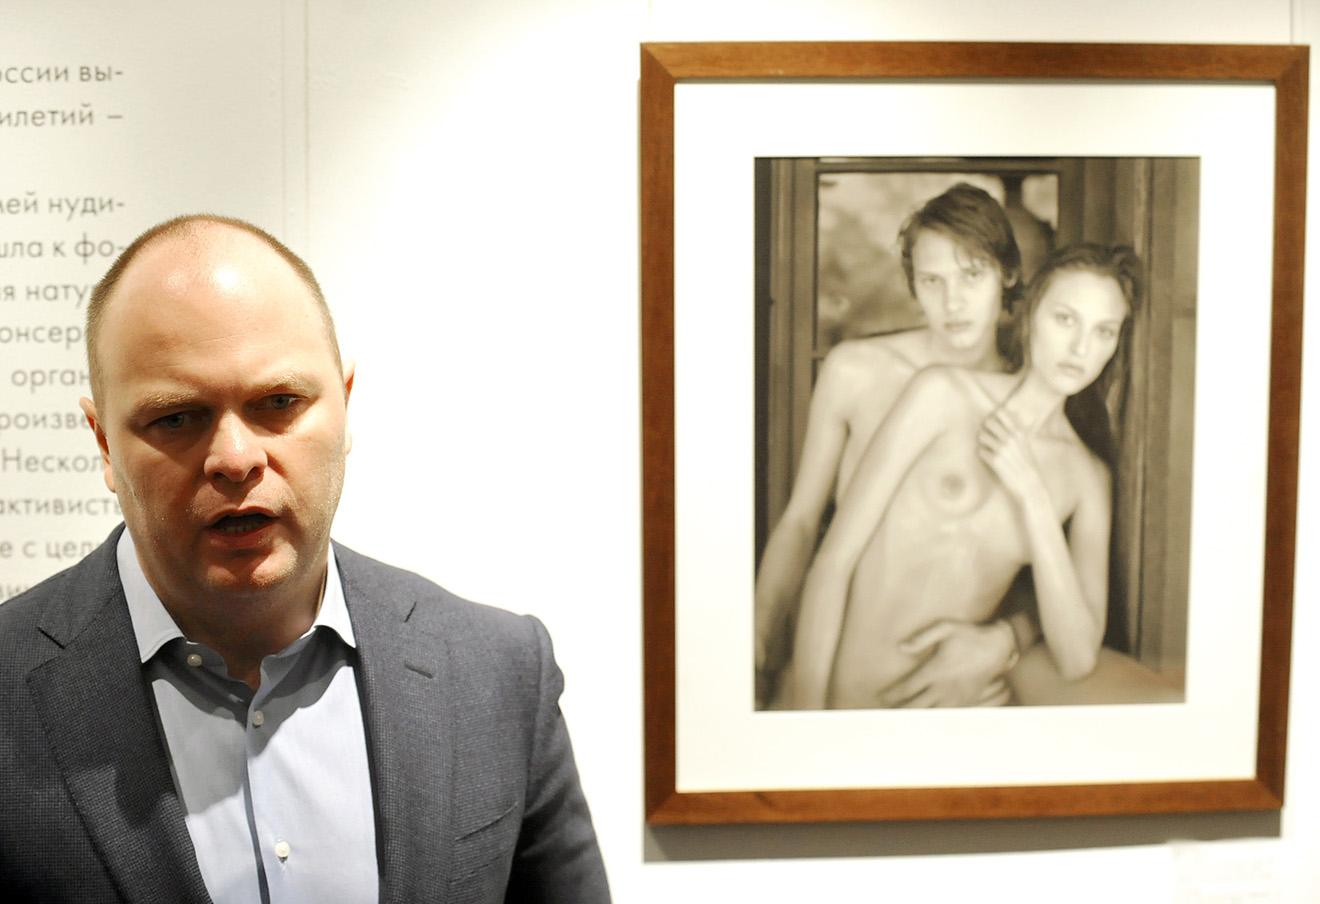 Антон Цветков. Фото: Андрей Махонин / ТАСС